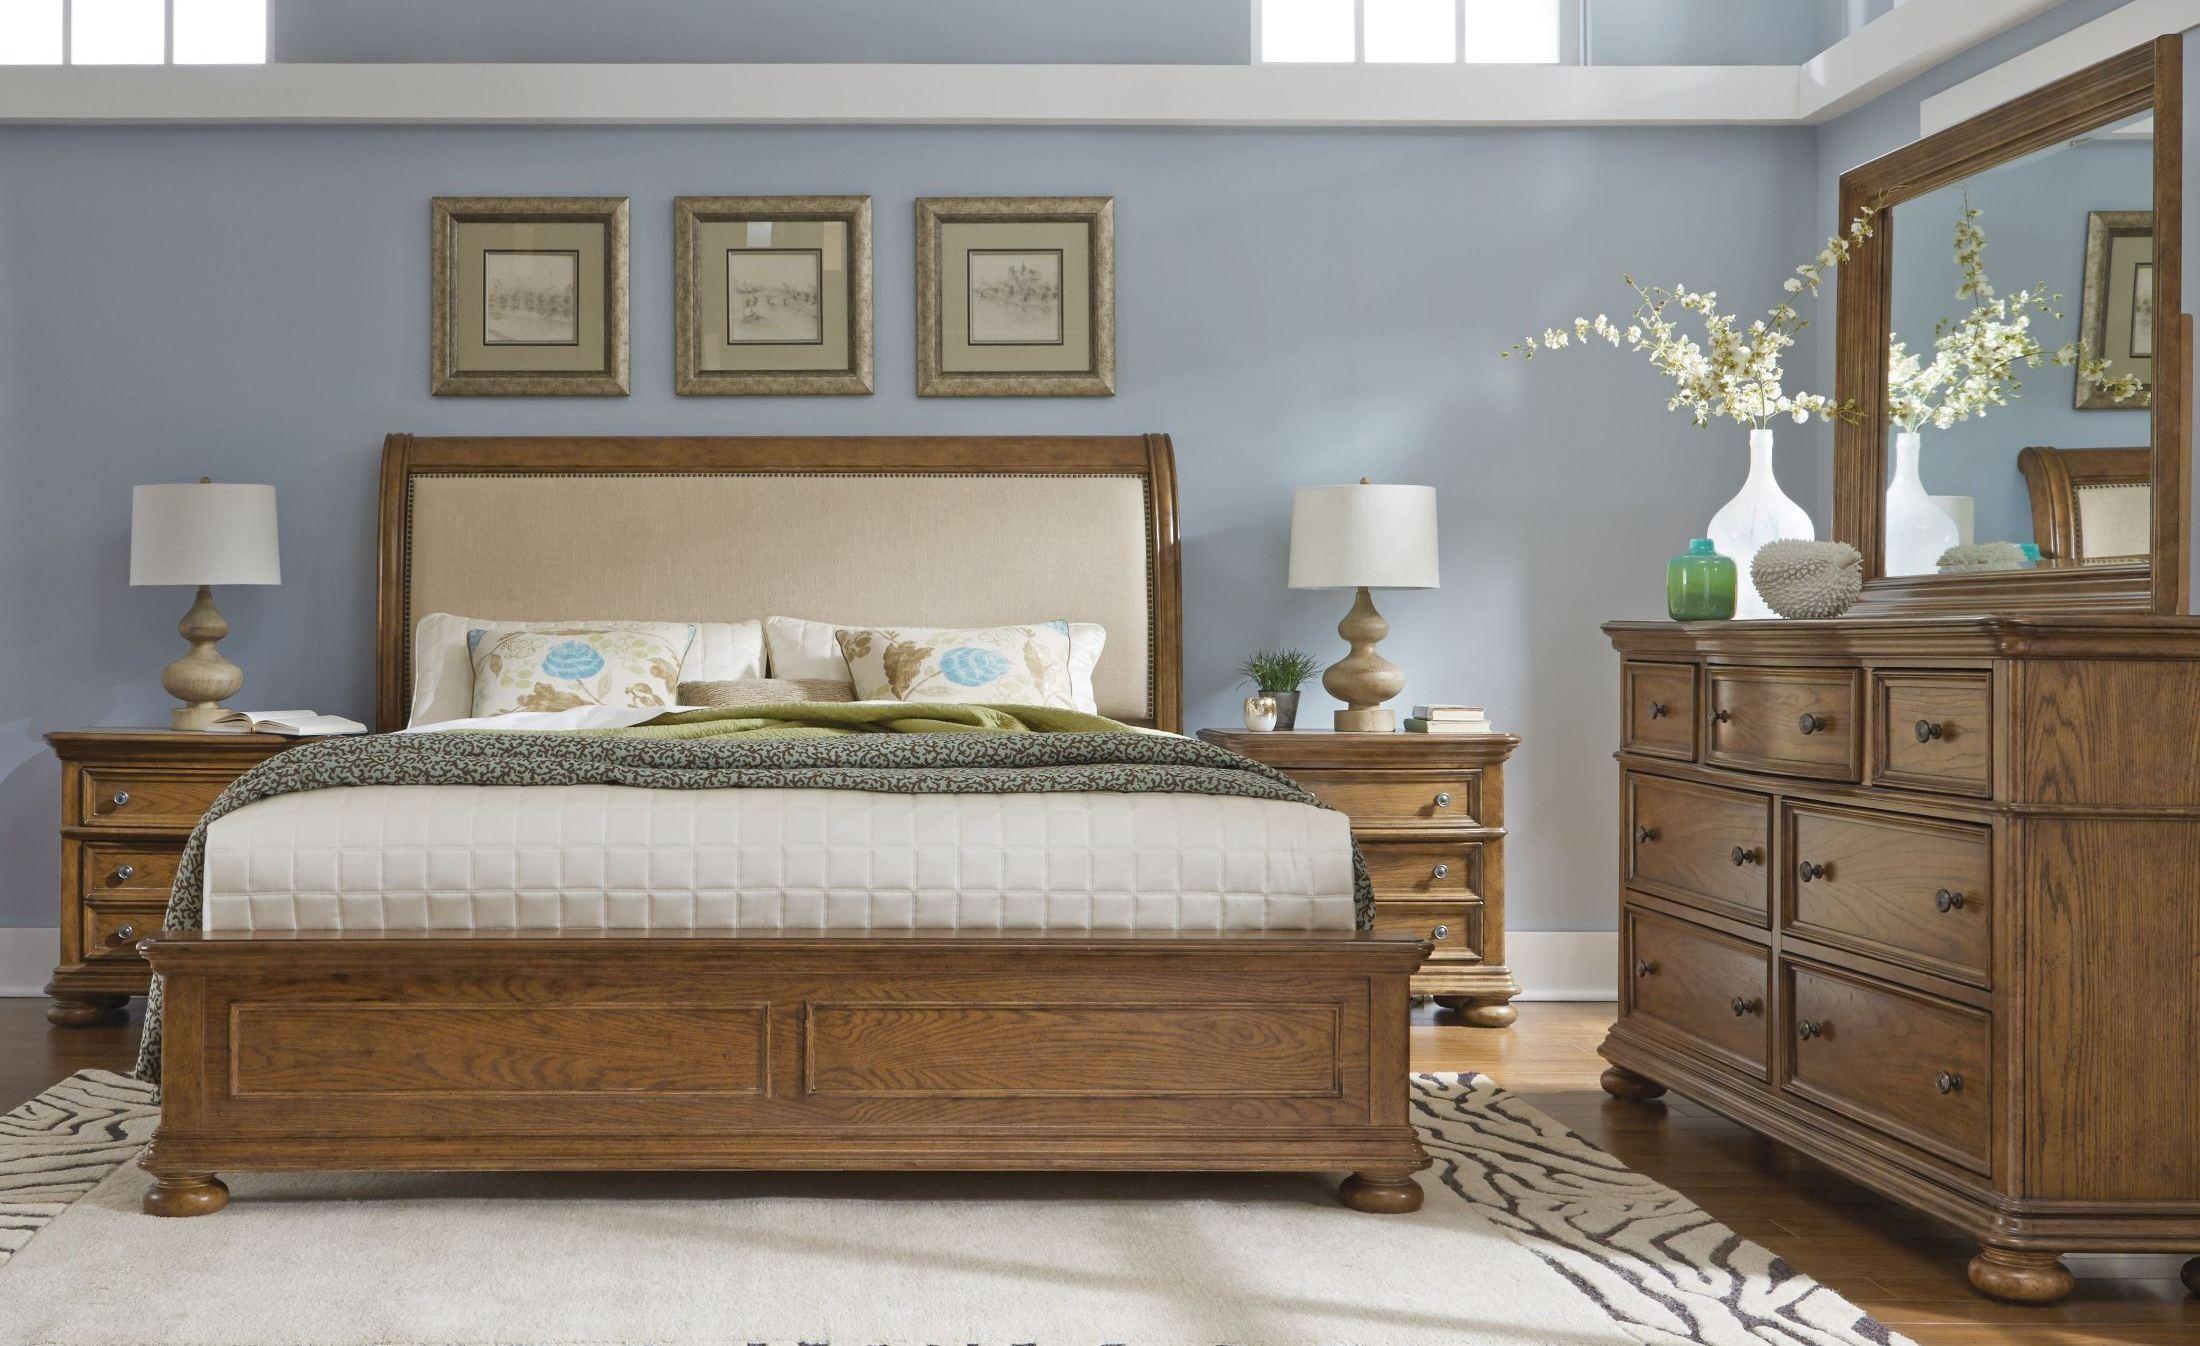 Paxton upholstered sleigh bedroom set from samuel lawrence 8674 250 251 400 coleman furniture for Upholstered sleigh bedroom set